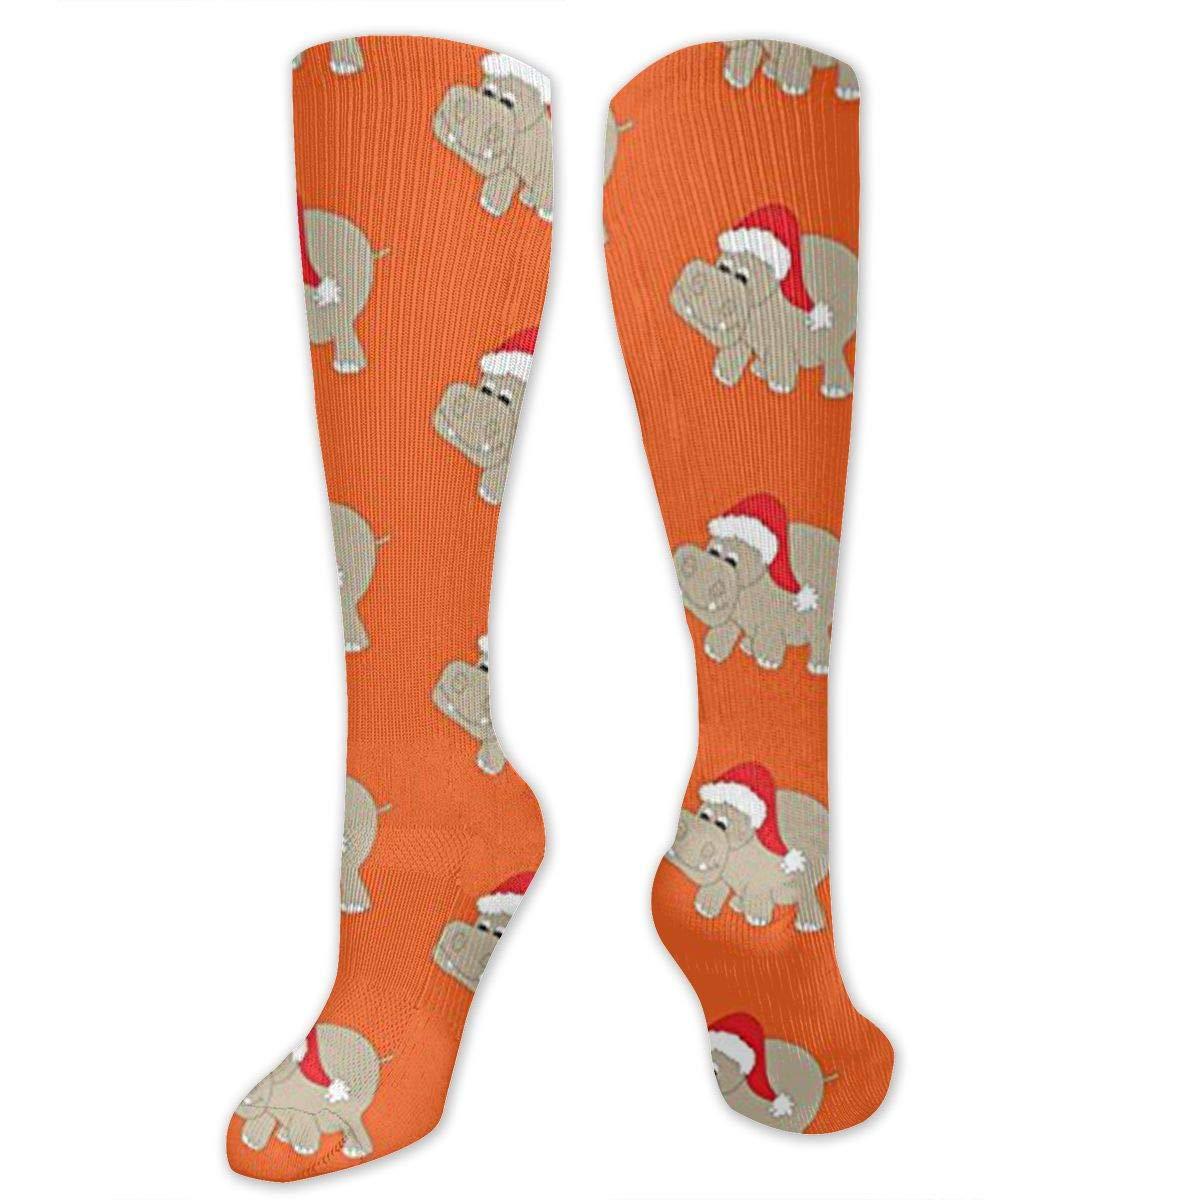 Best Medical,for Running Ygsdf59 Santa Hippo Orange Compression Socks for Women and Men Travel Varicose Veins Athletic